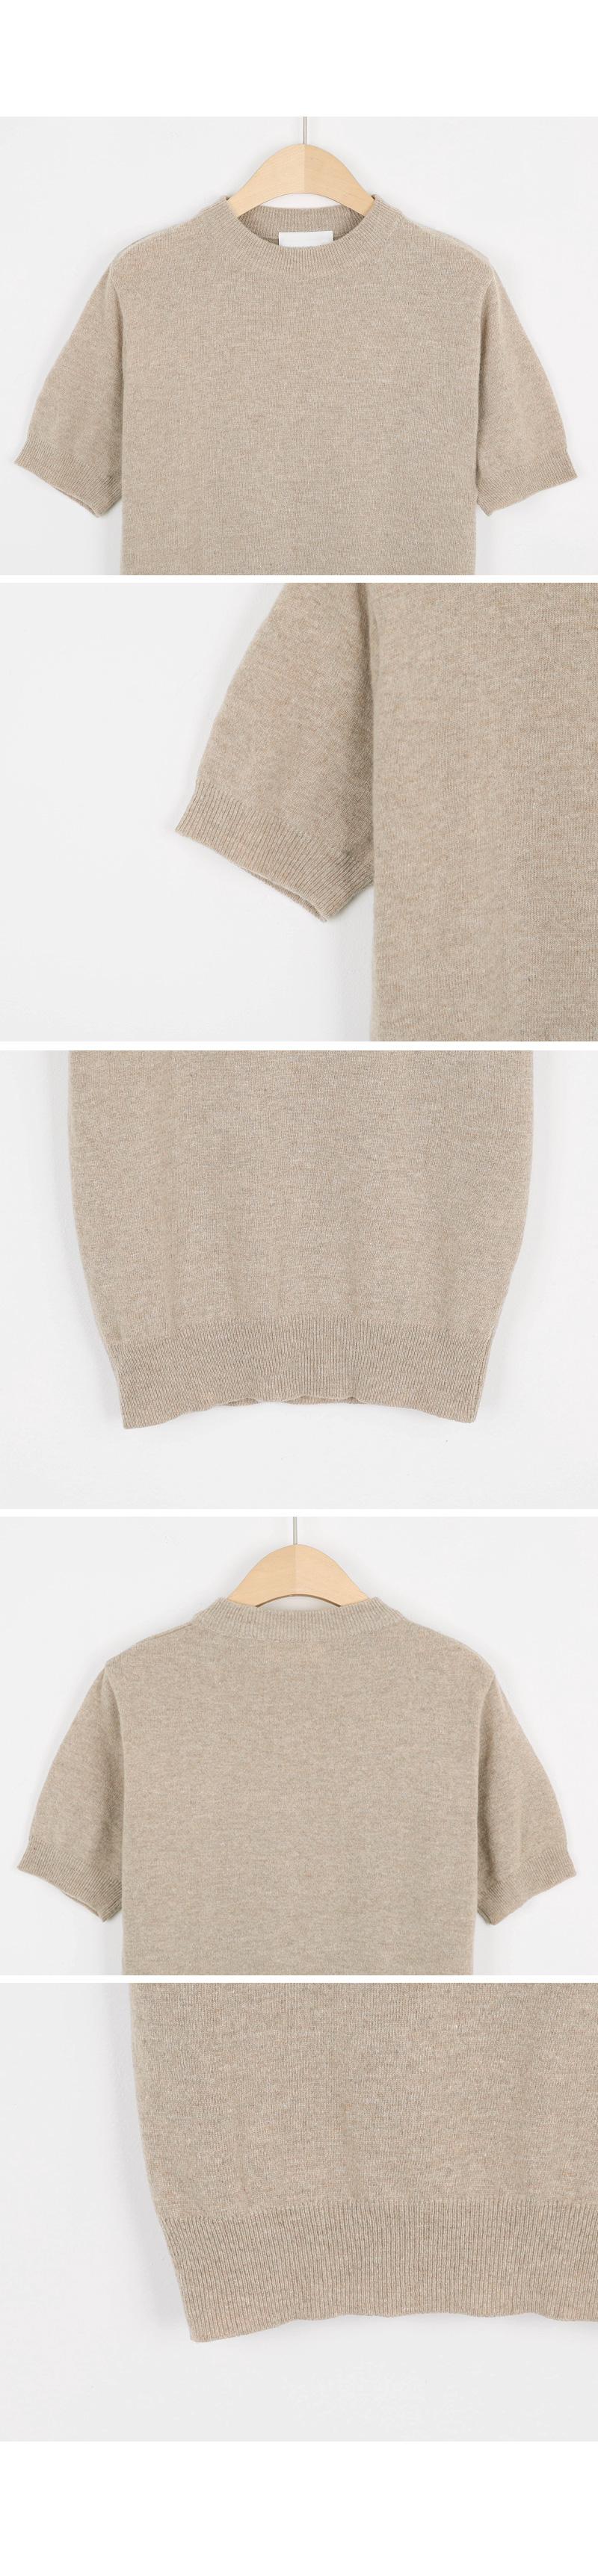 Short sleeve knit hem